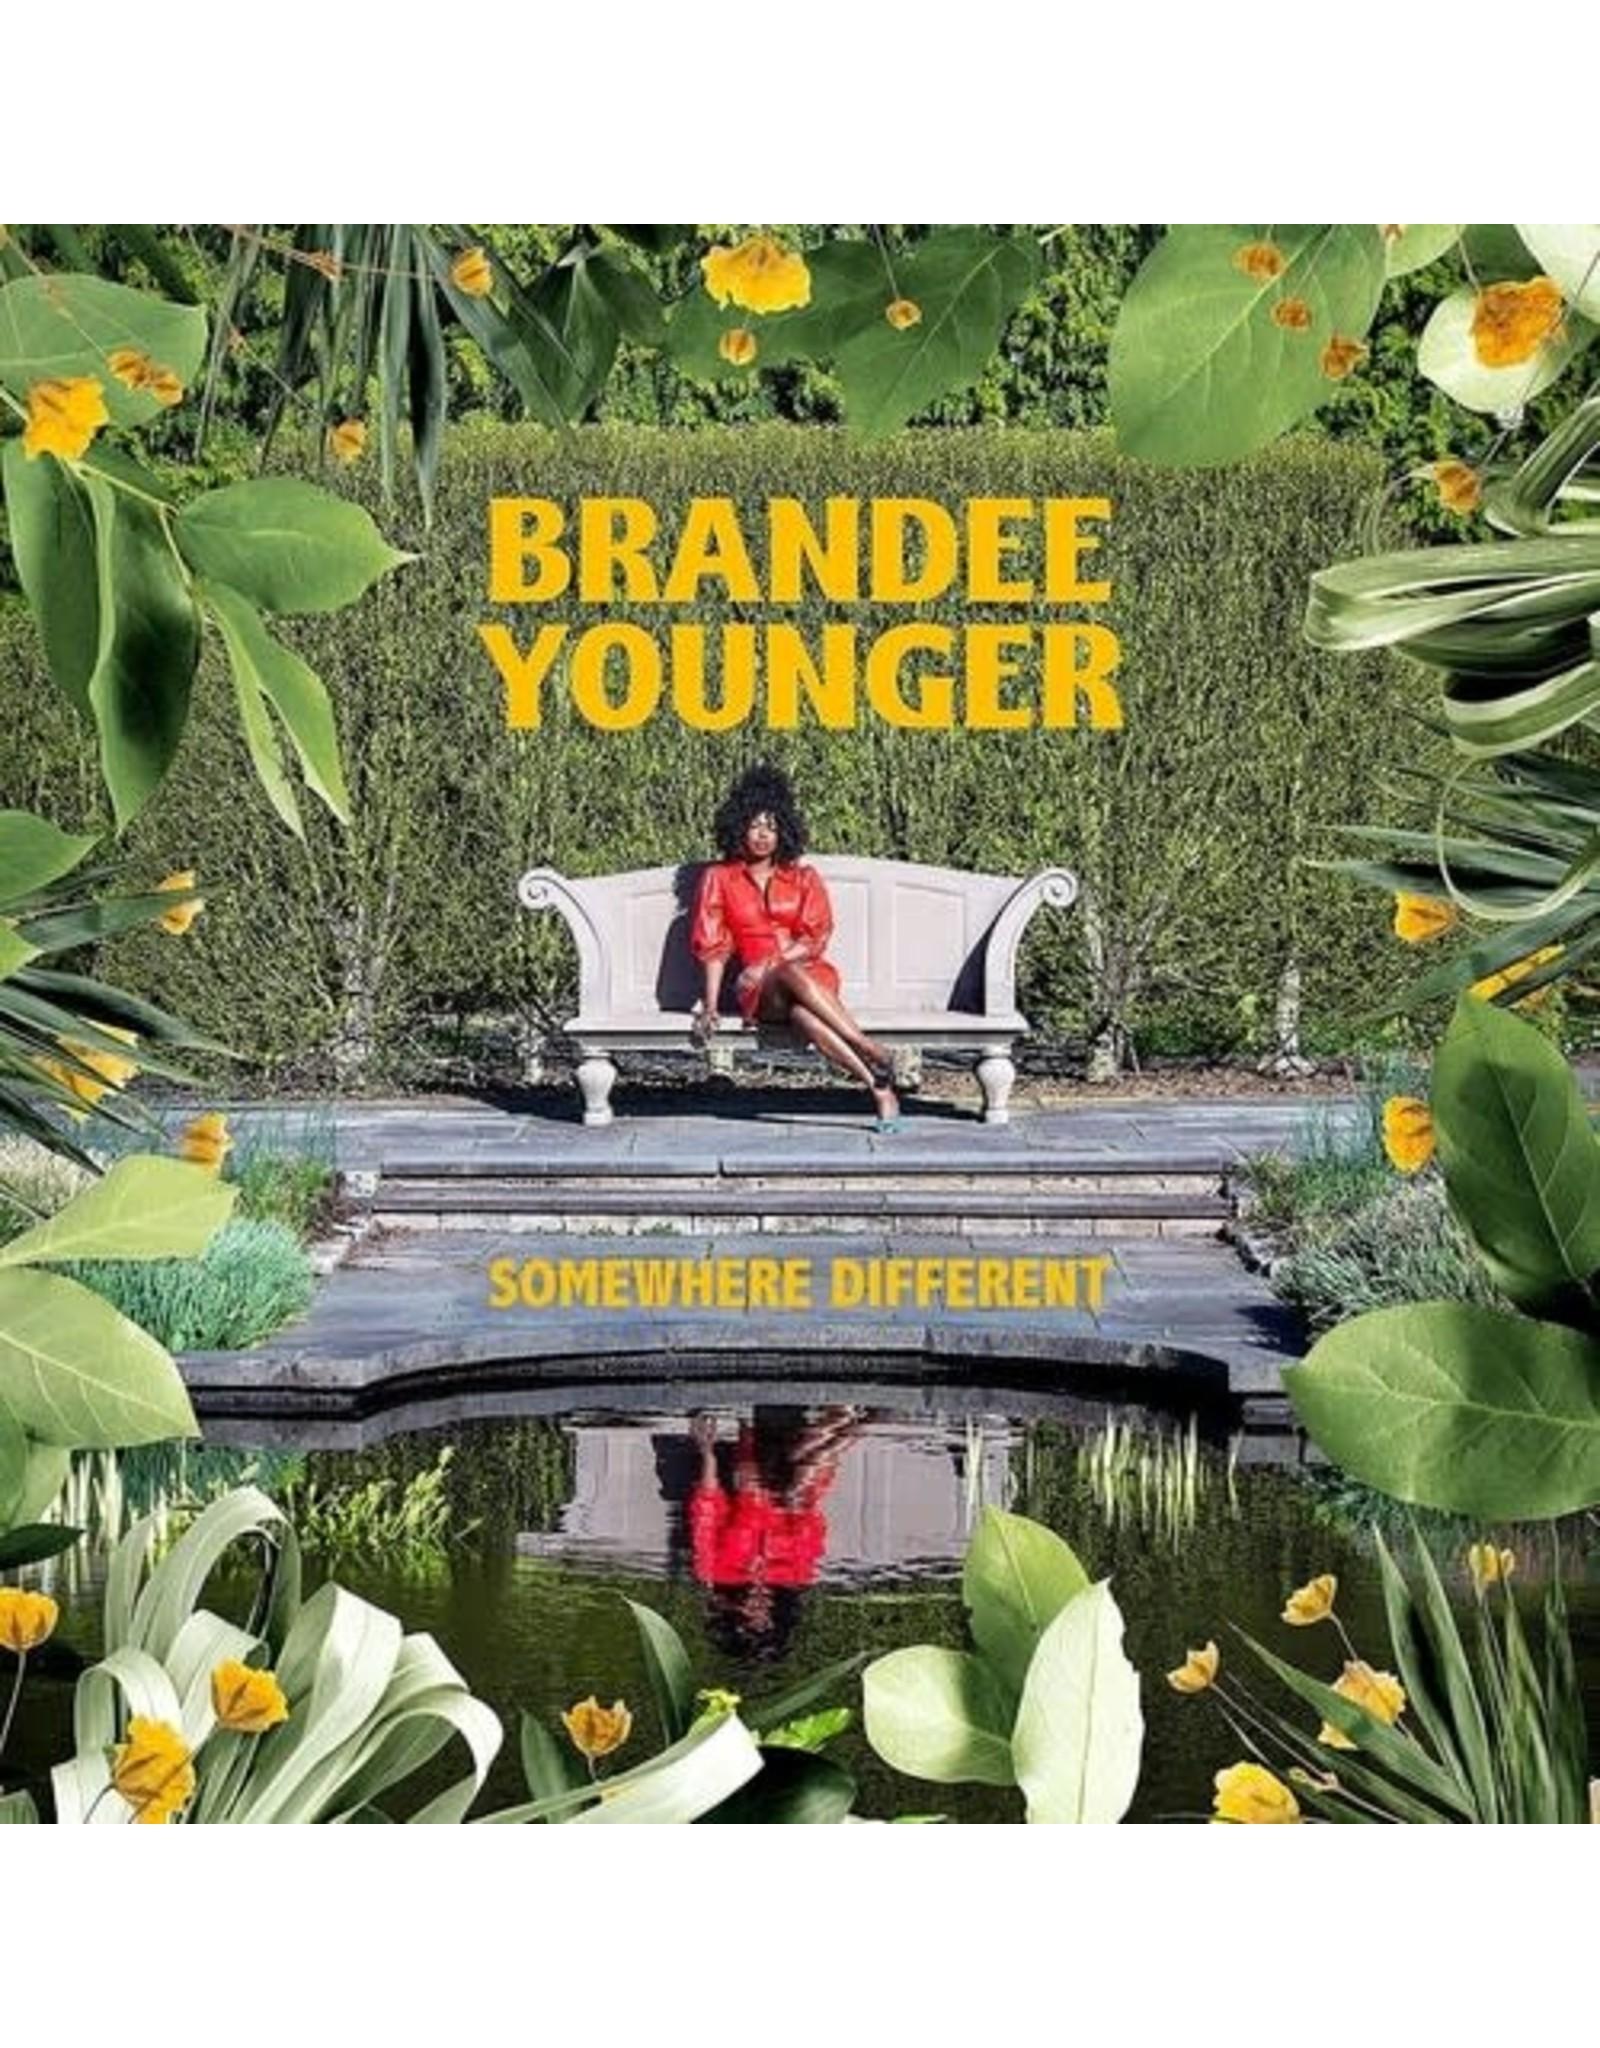 New Vinyl Brandee Younger - Somewhere Different LP